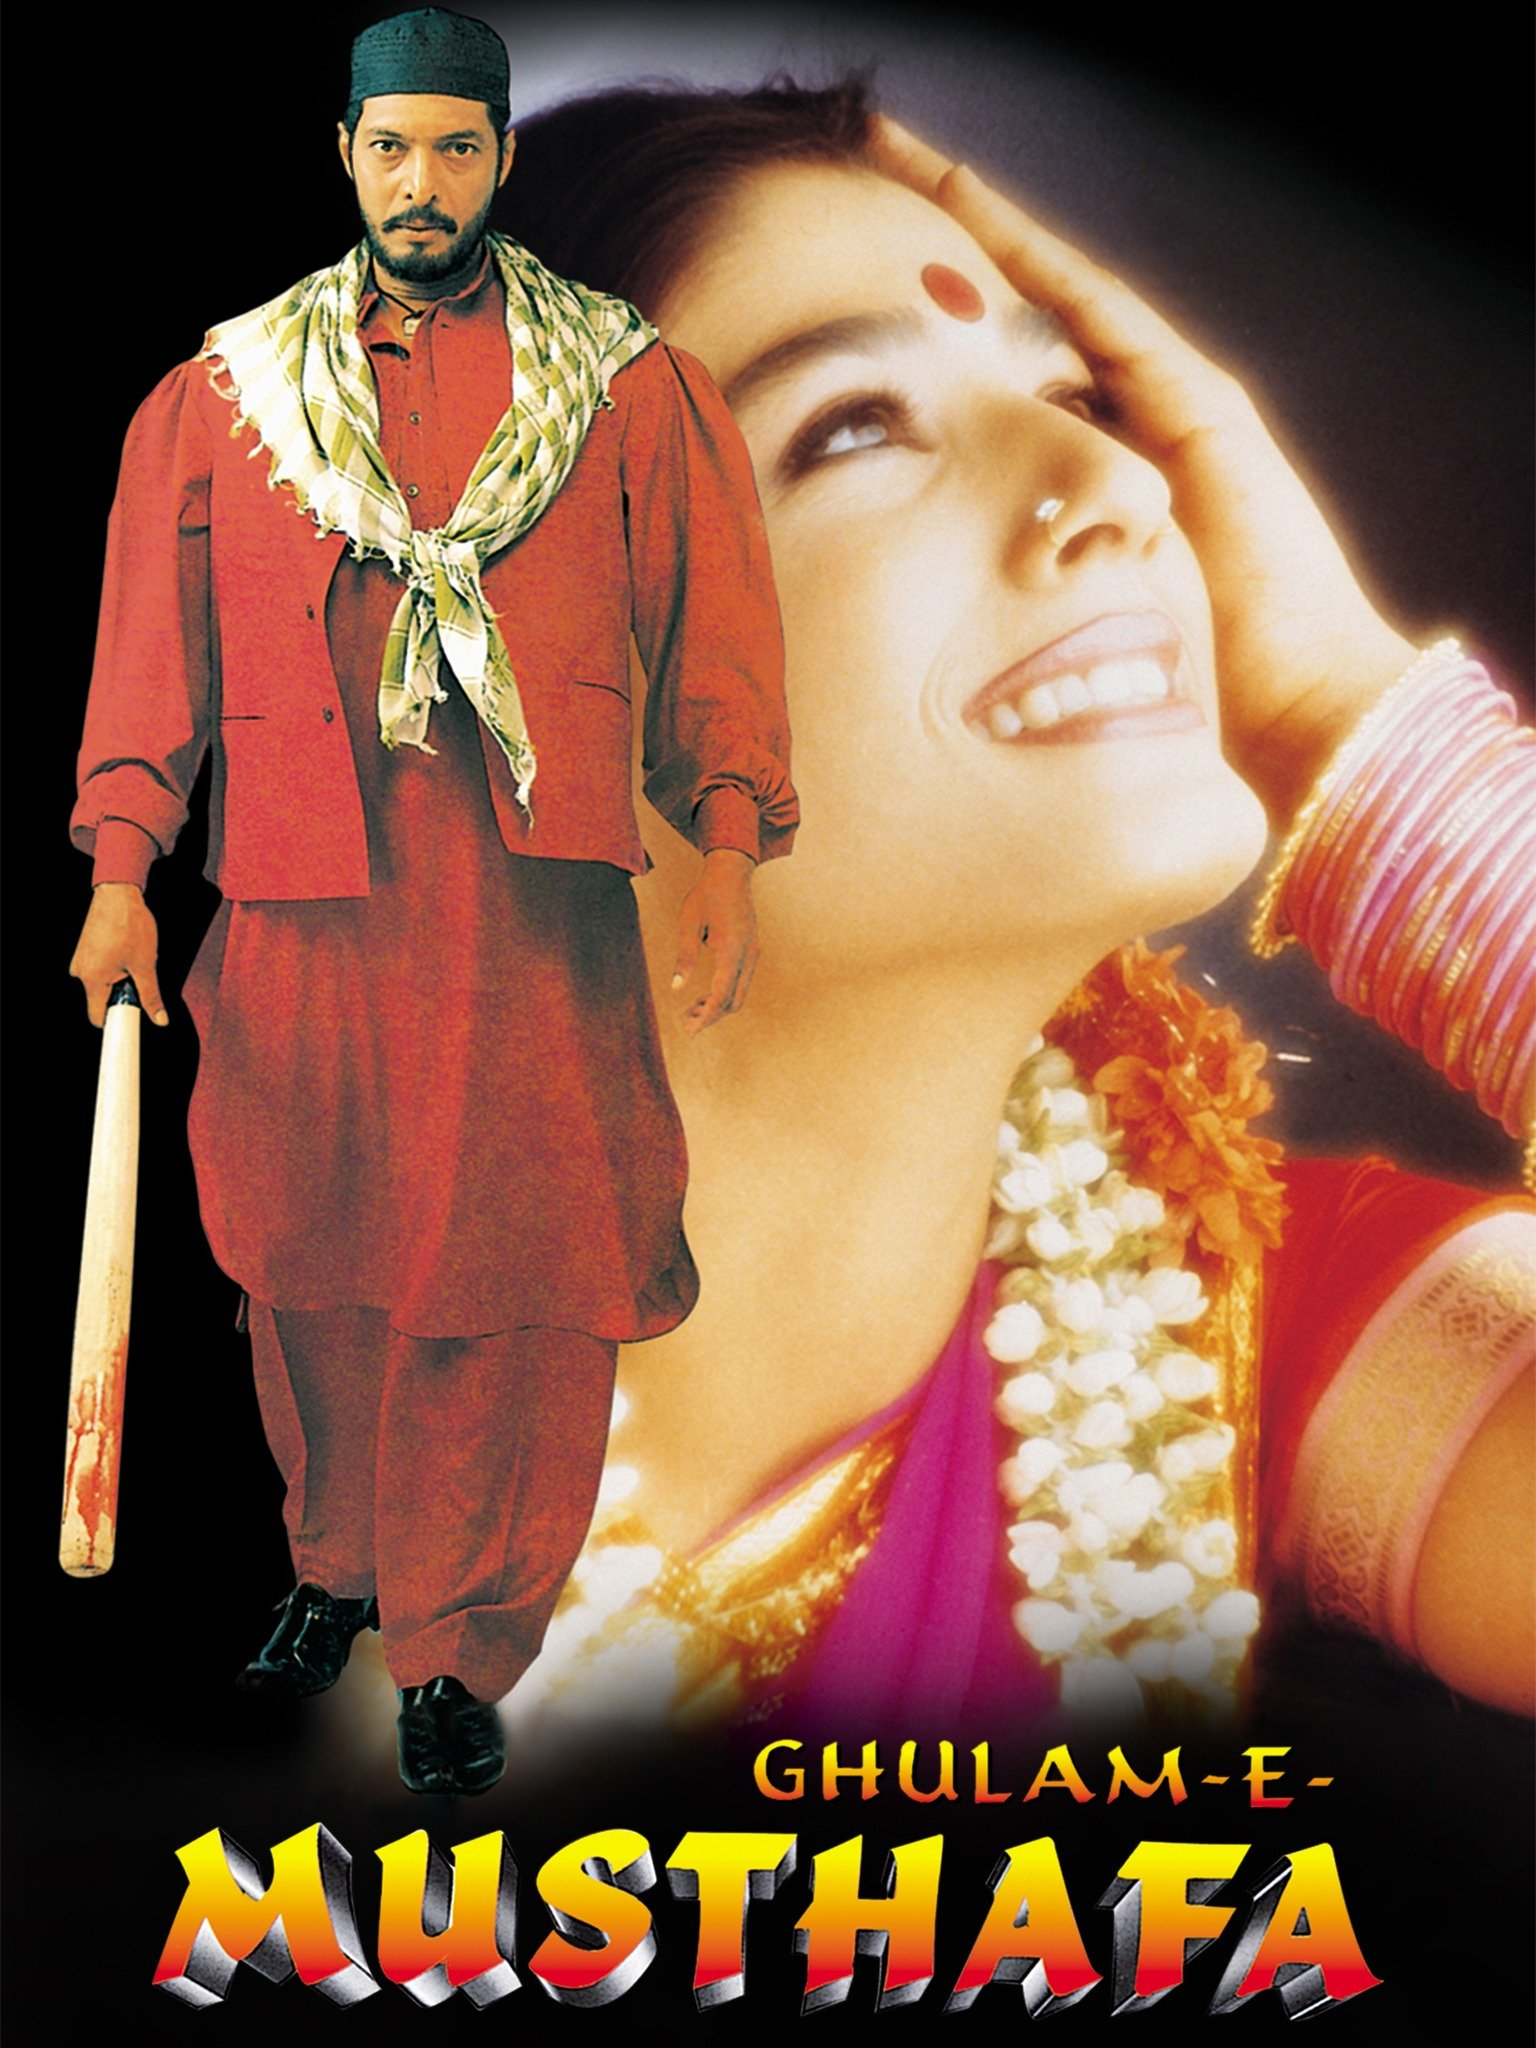 Ghulam-E-Musthafa